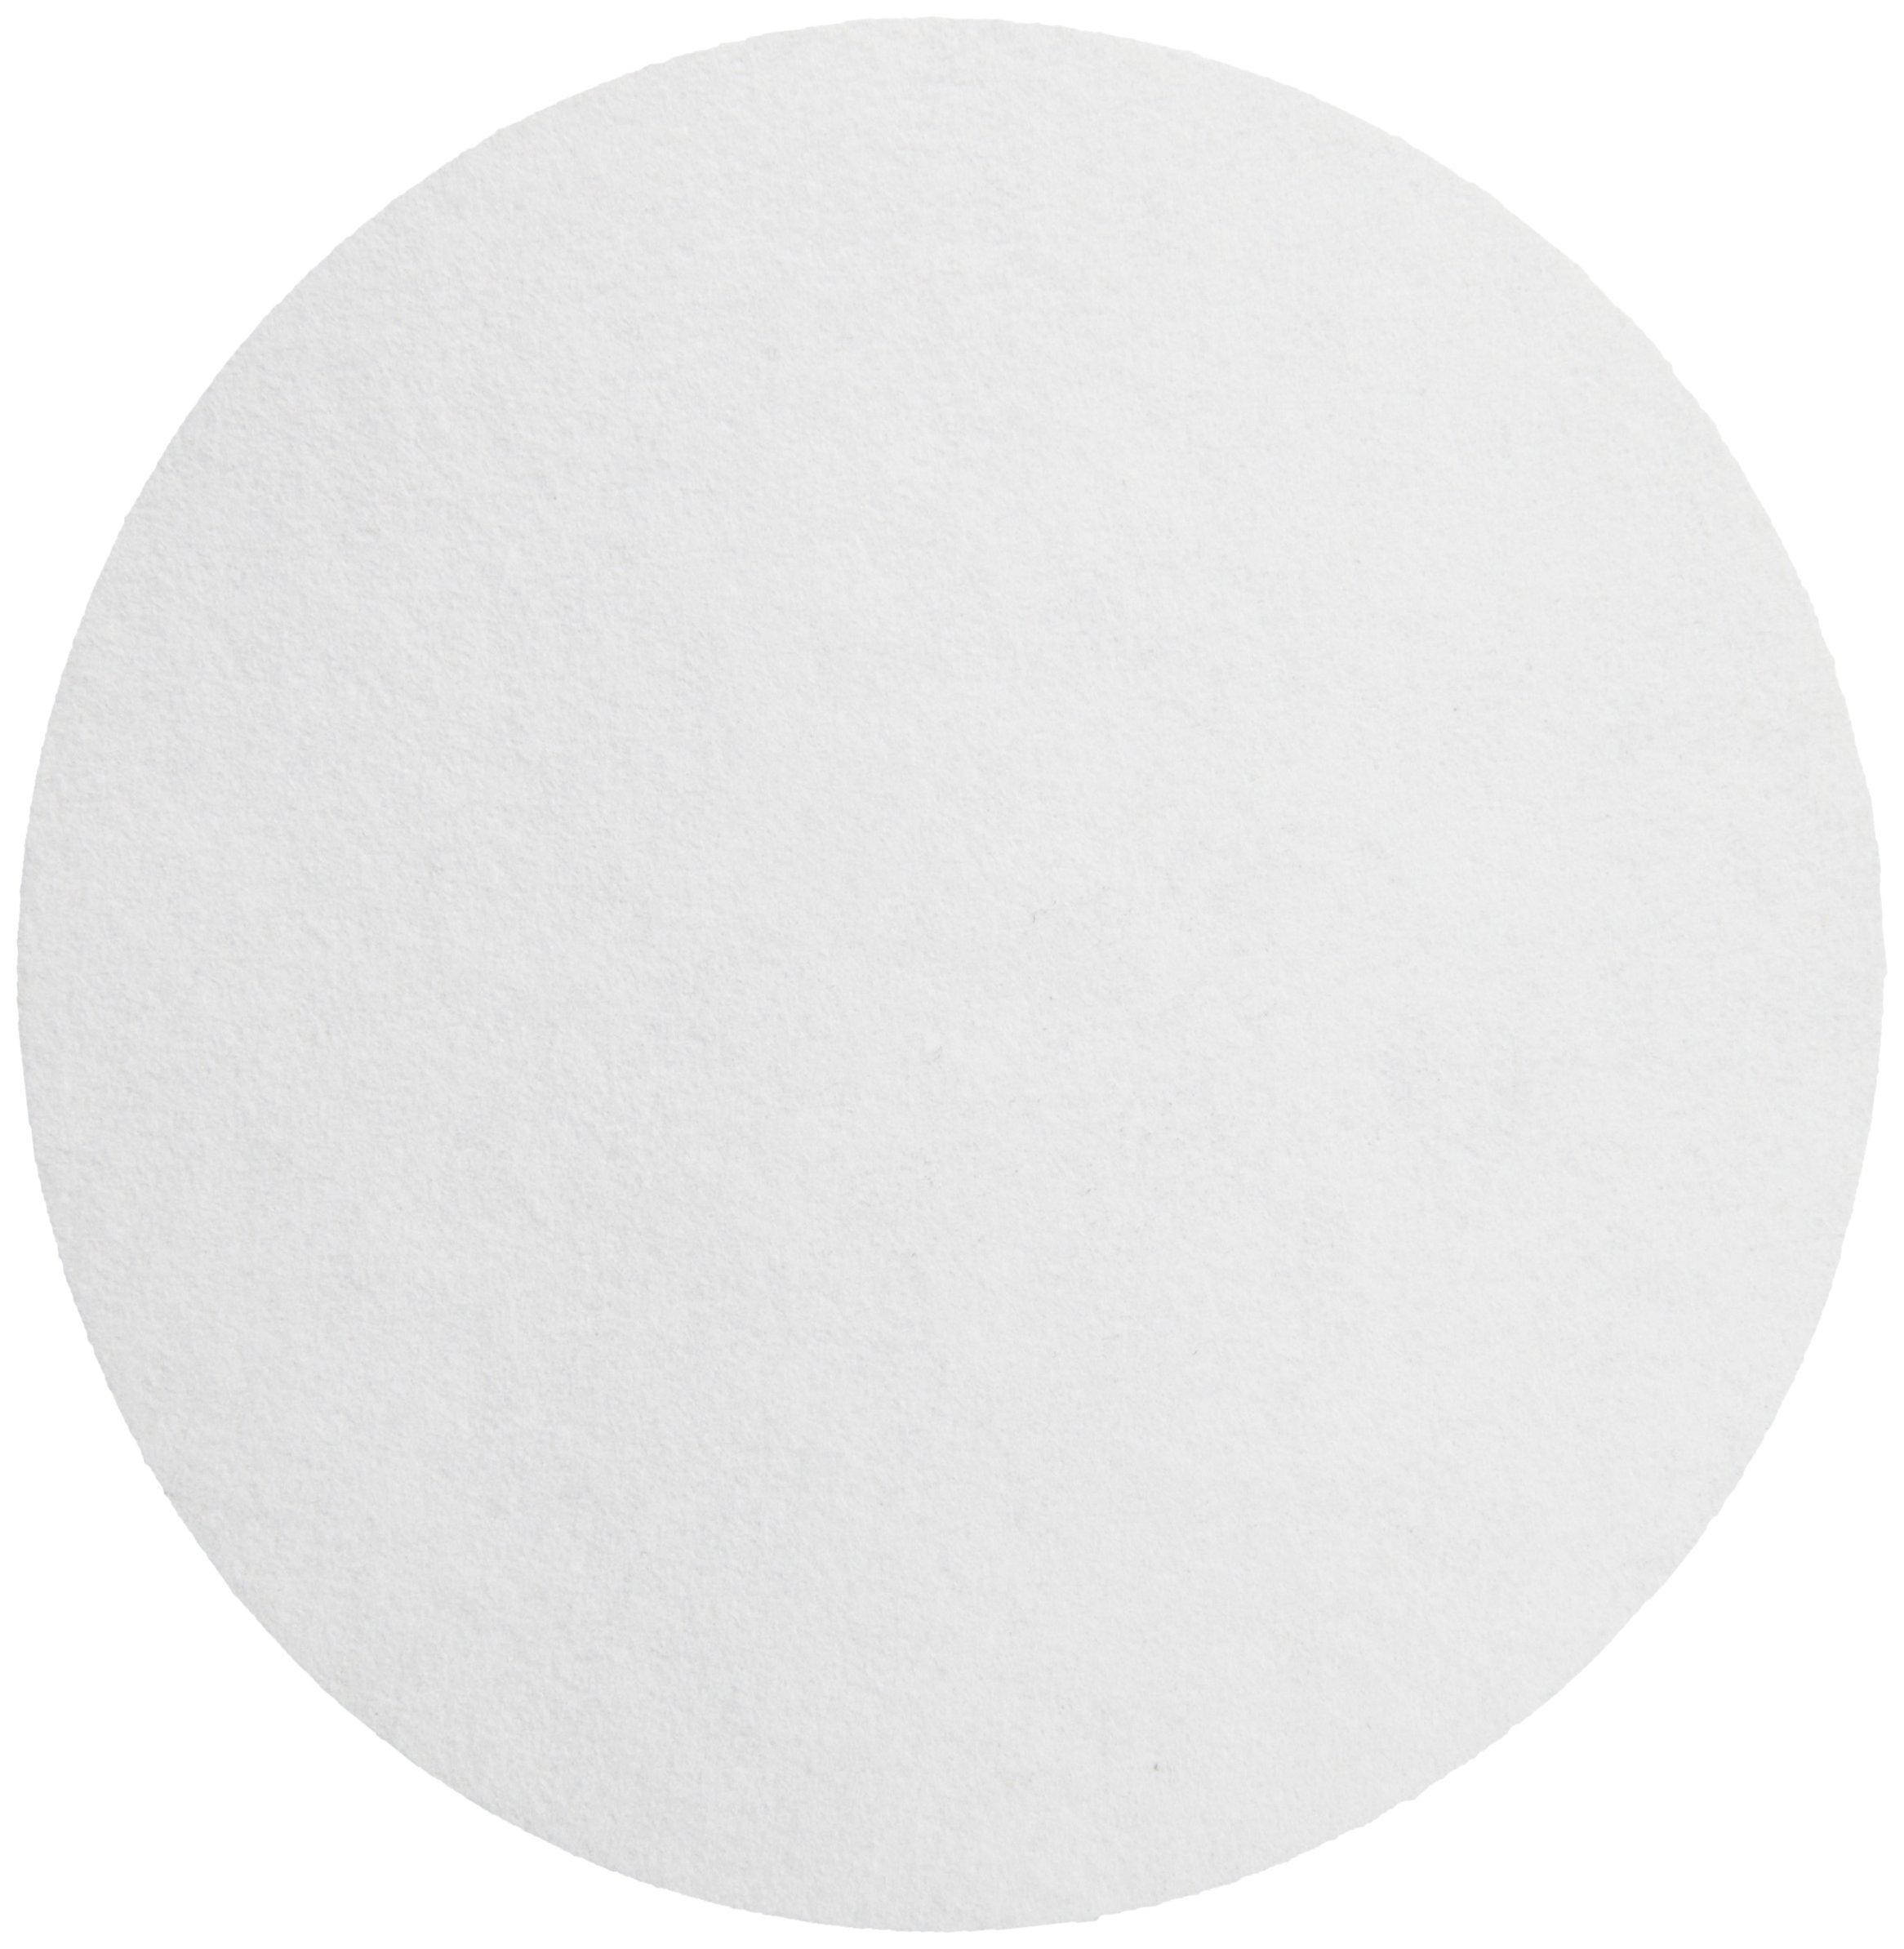 Whatman 1440-125 Ashless Quantitative Filter Paper, 12.5cm Diameter, 8 Micron, Grade 40 (Pack of 100) by Whatman